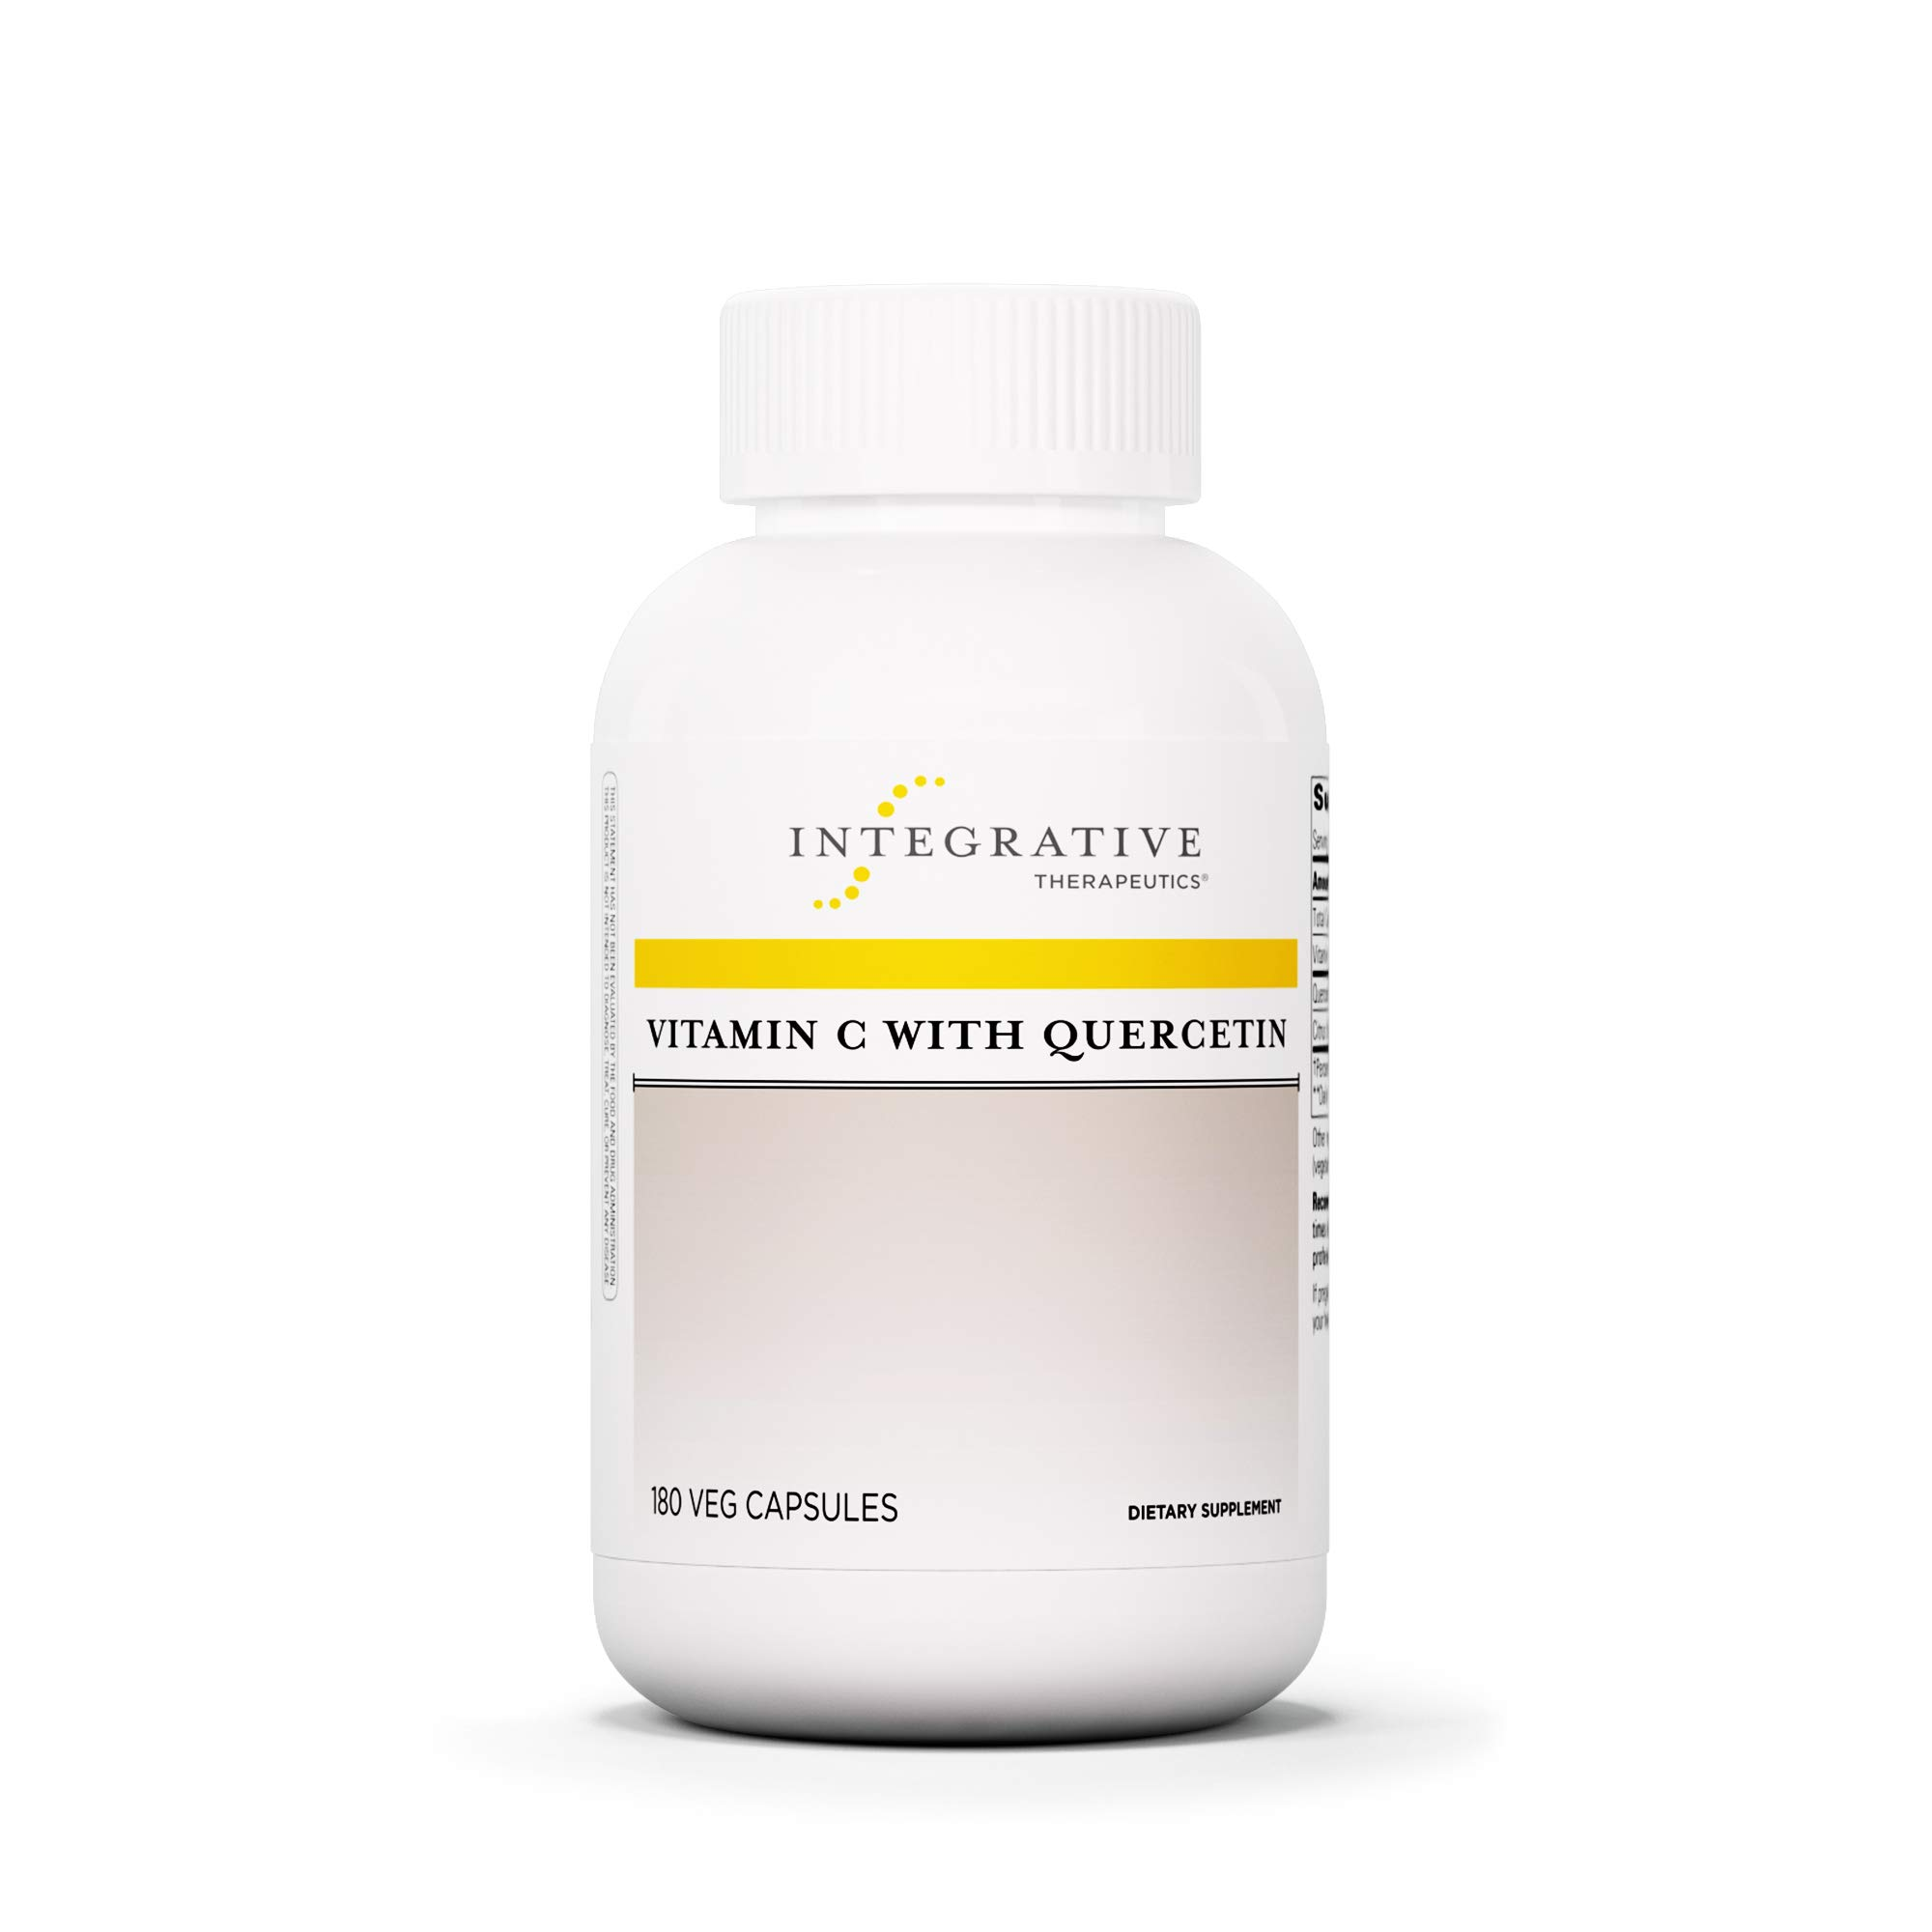 Integrative Therapeutics - Vitamin C with Quercetin - Supplement for Proper Immune Balance Support - 180 Capsules by Integrative Therapeutics